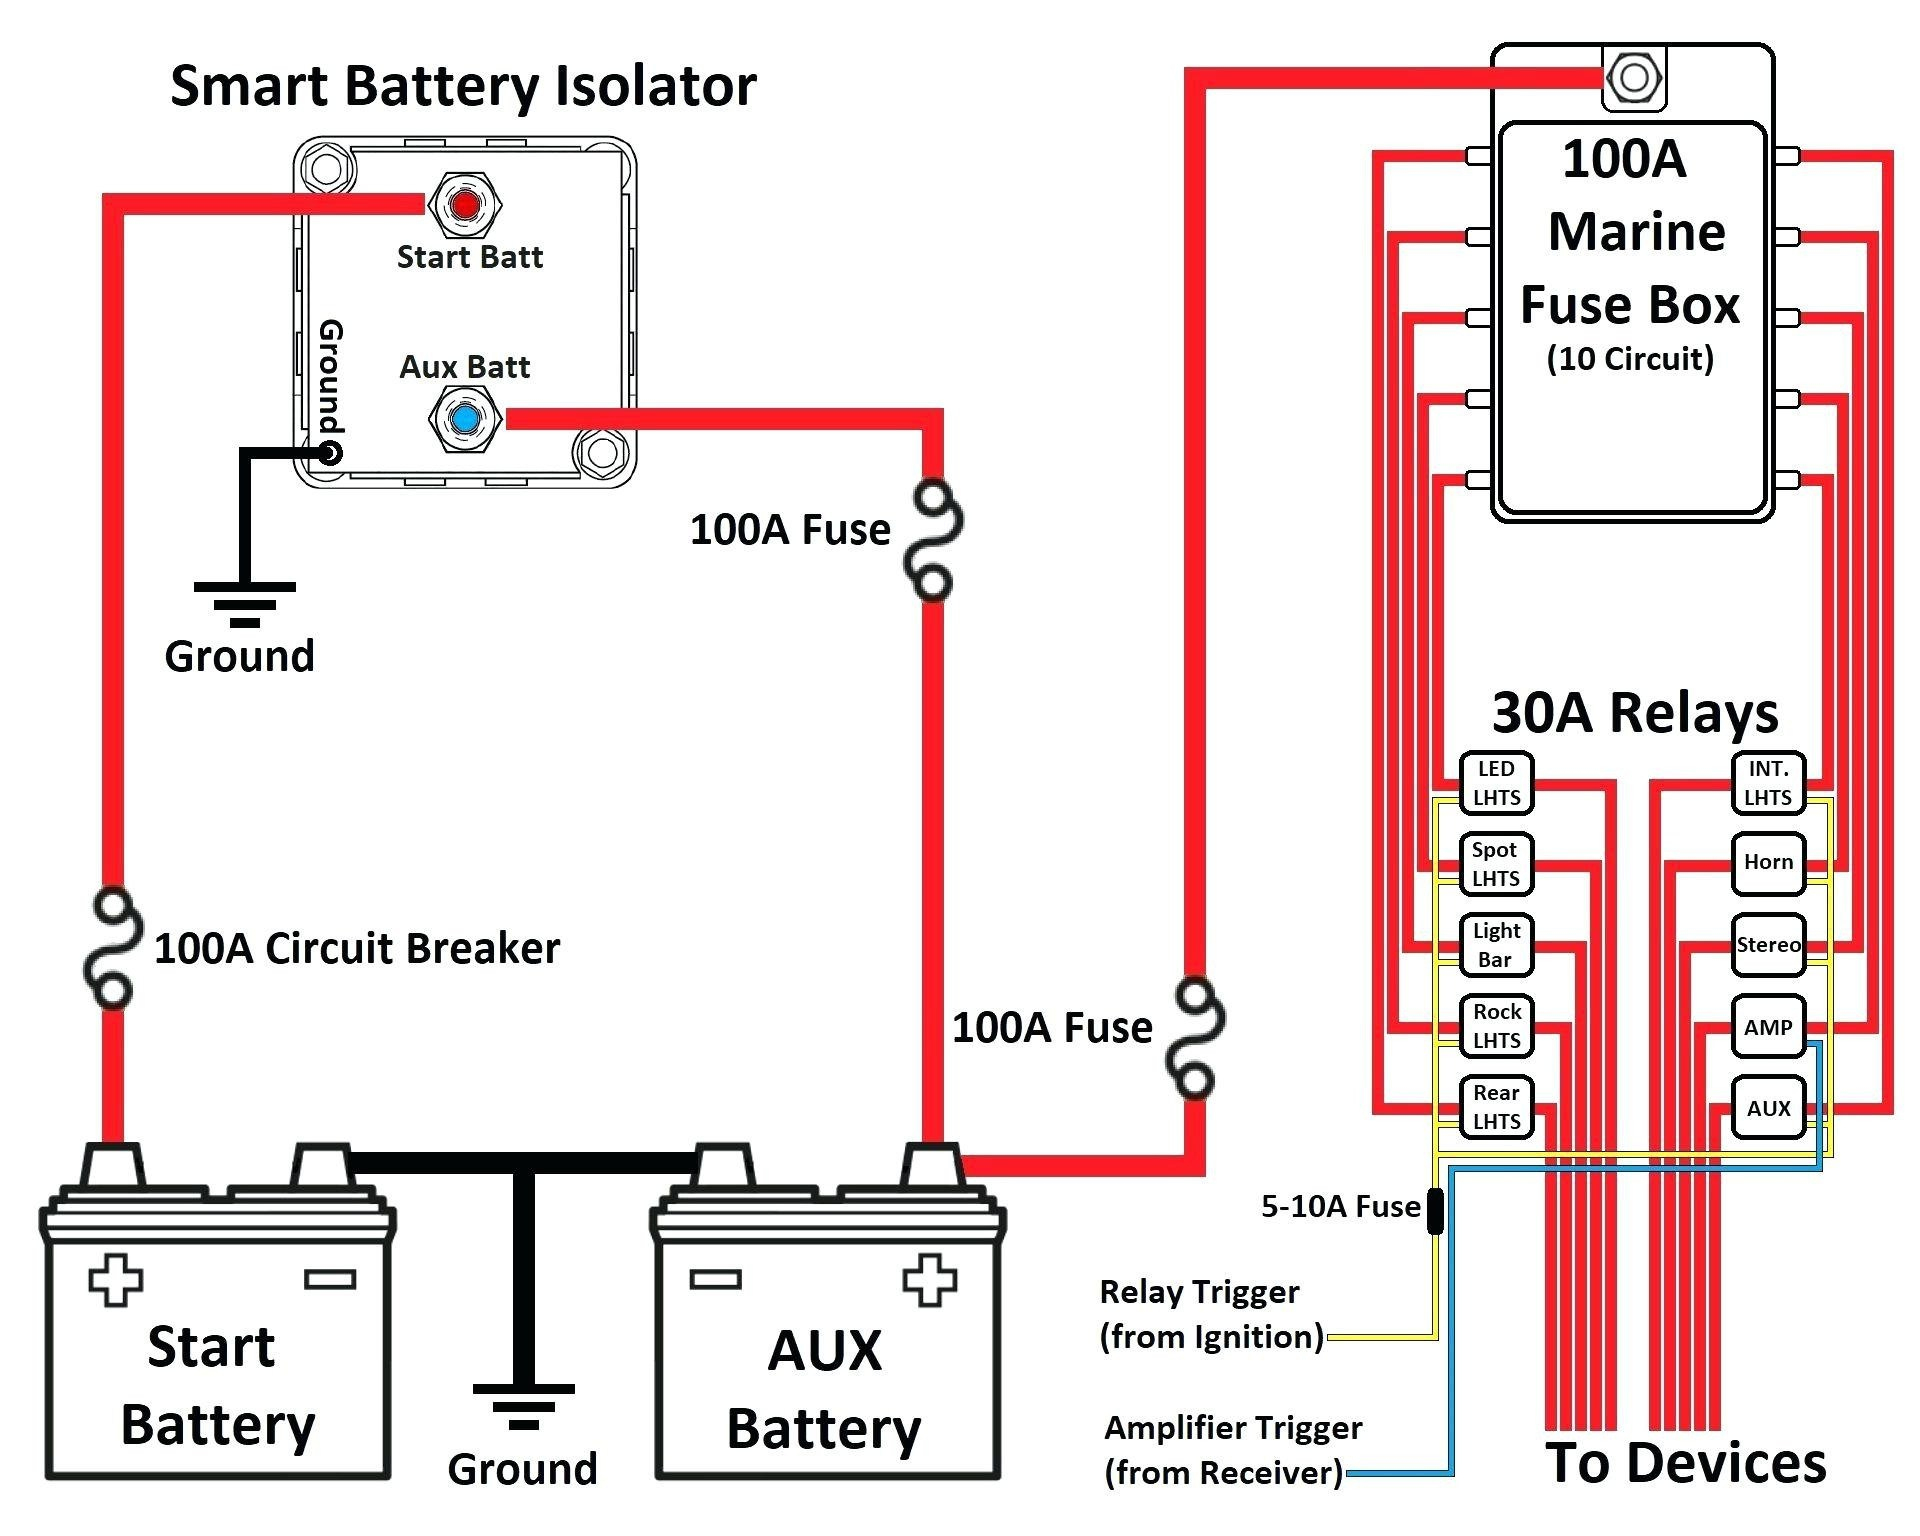 24 Volt Wiring Diagram For Trolling Motor Batts - Wiring Diagram Essig - 24 Volt Battery Wiring Diagram